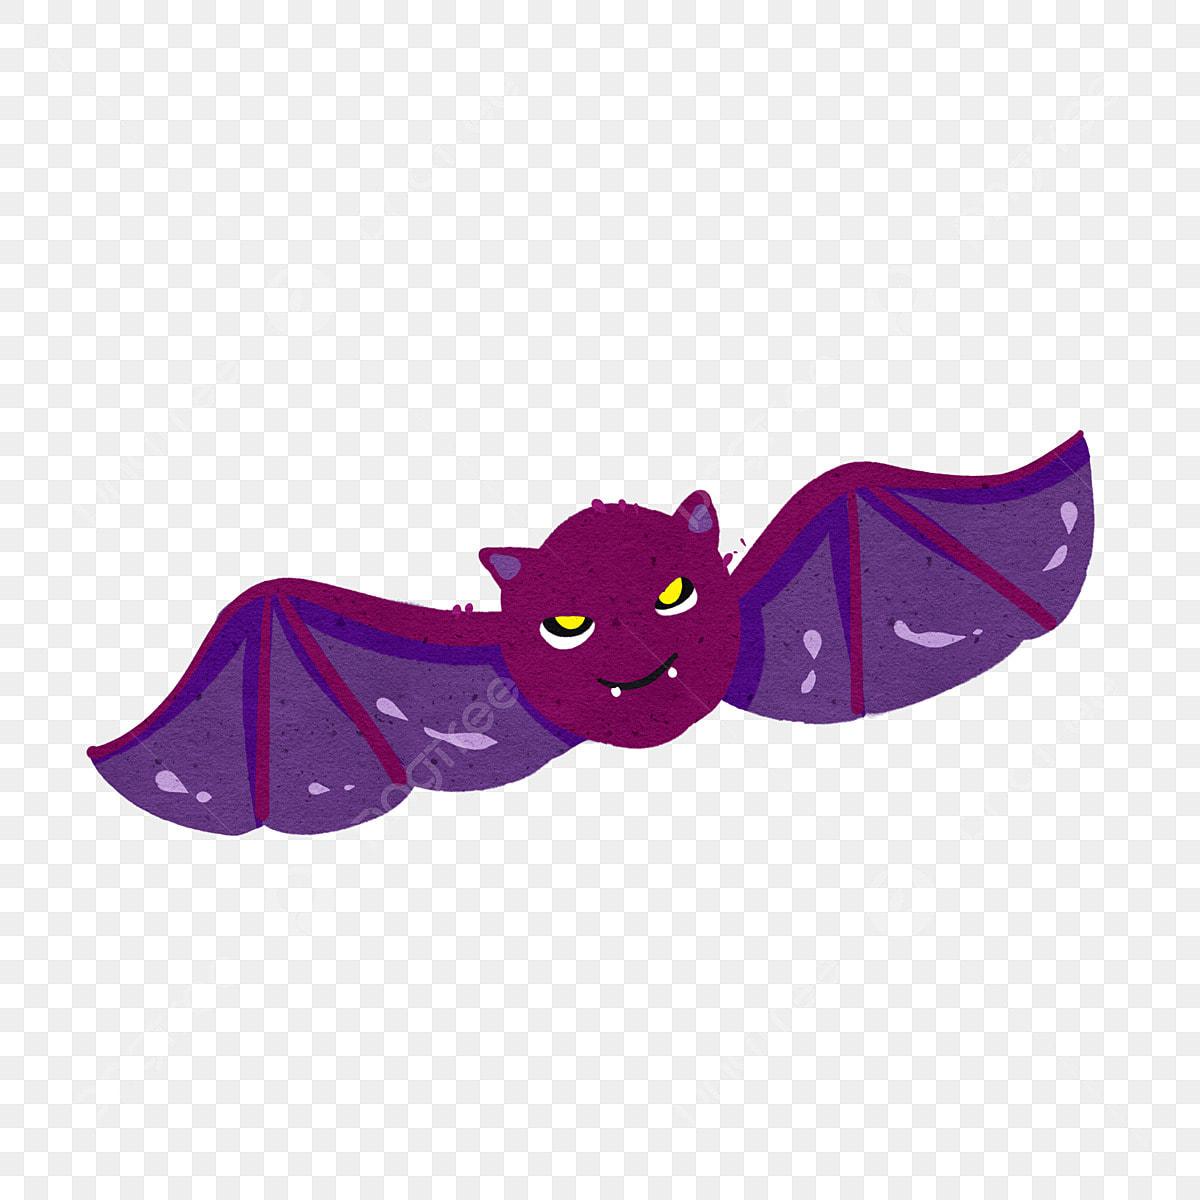 Mao Desenhada Elemento De Desenho Morcego Abobora Halloween Dia